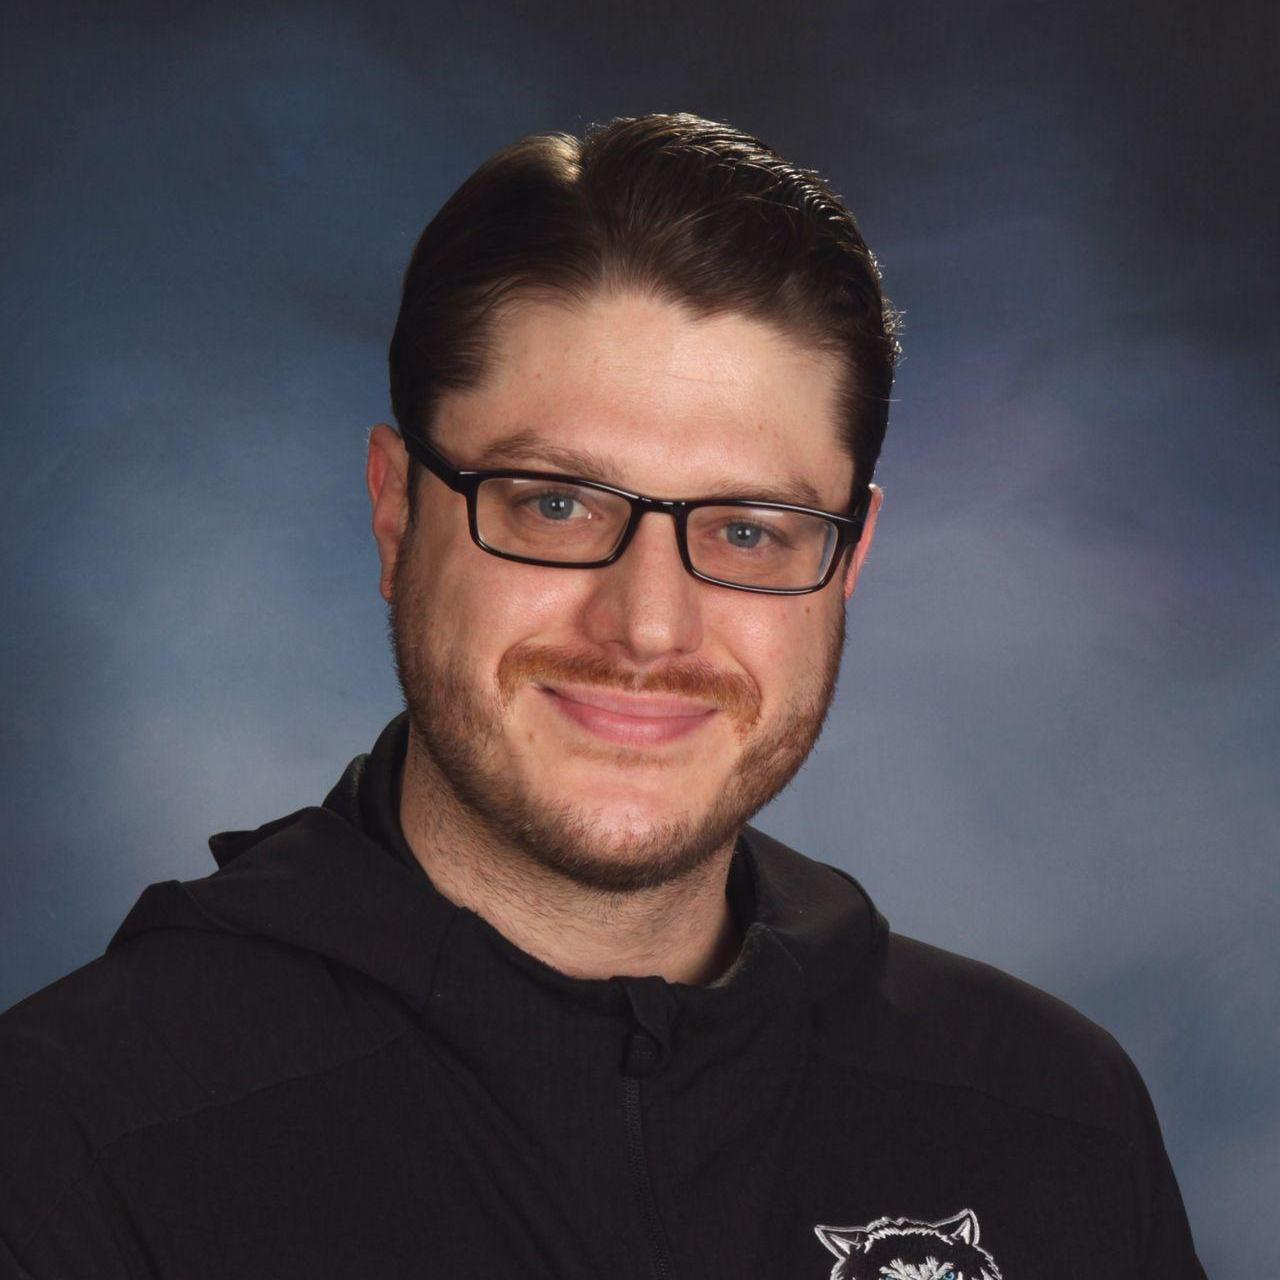 Mr. Connor Bratyanski